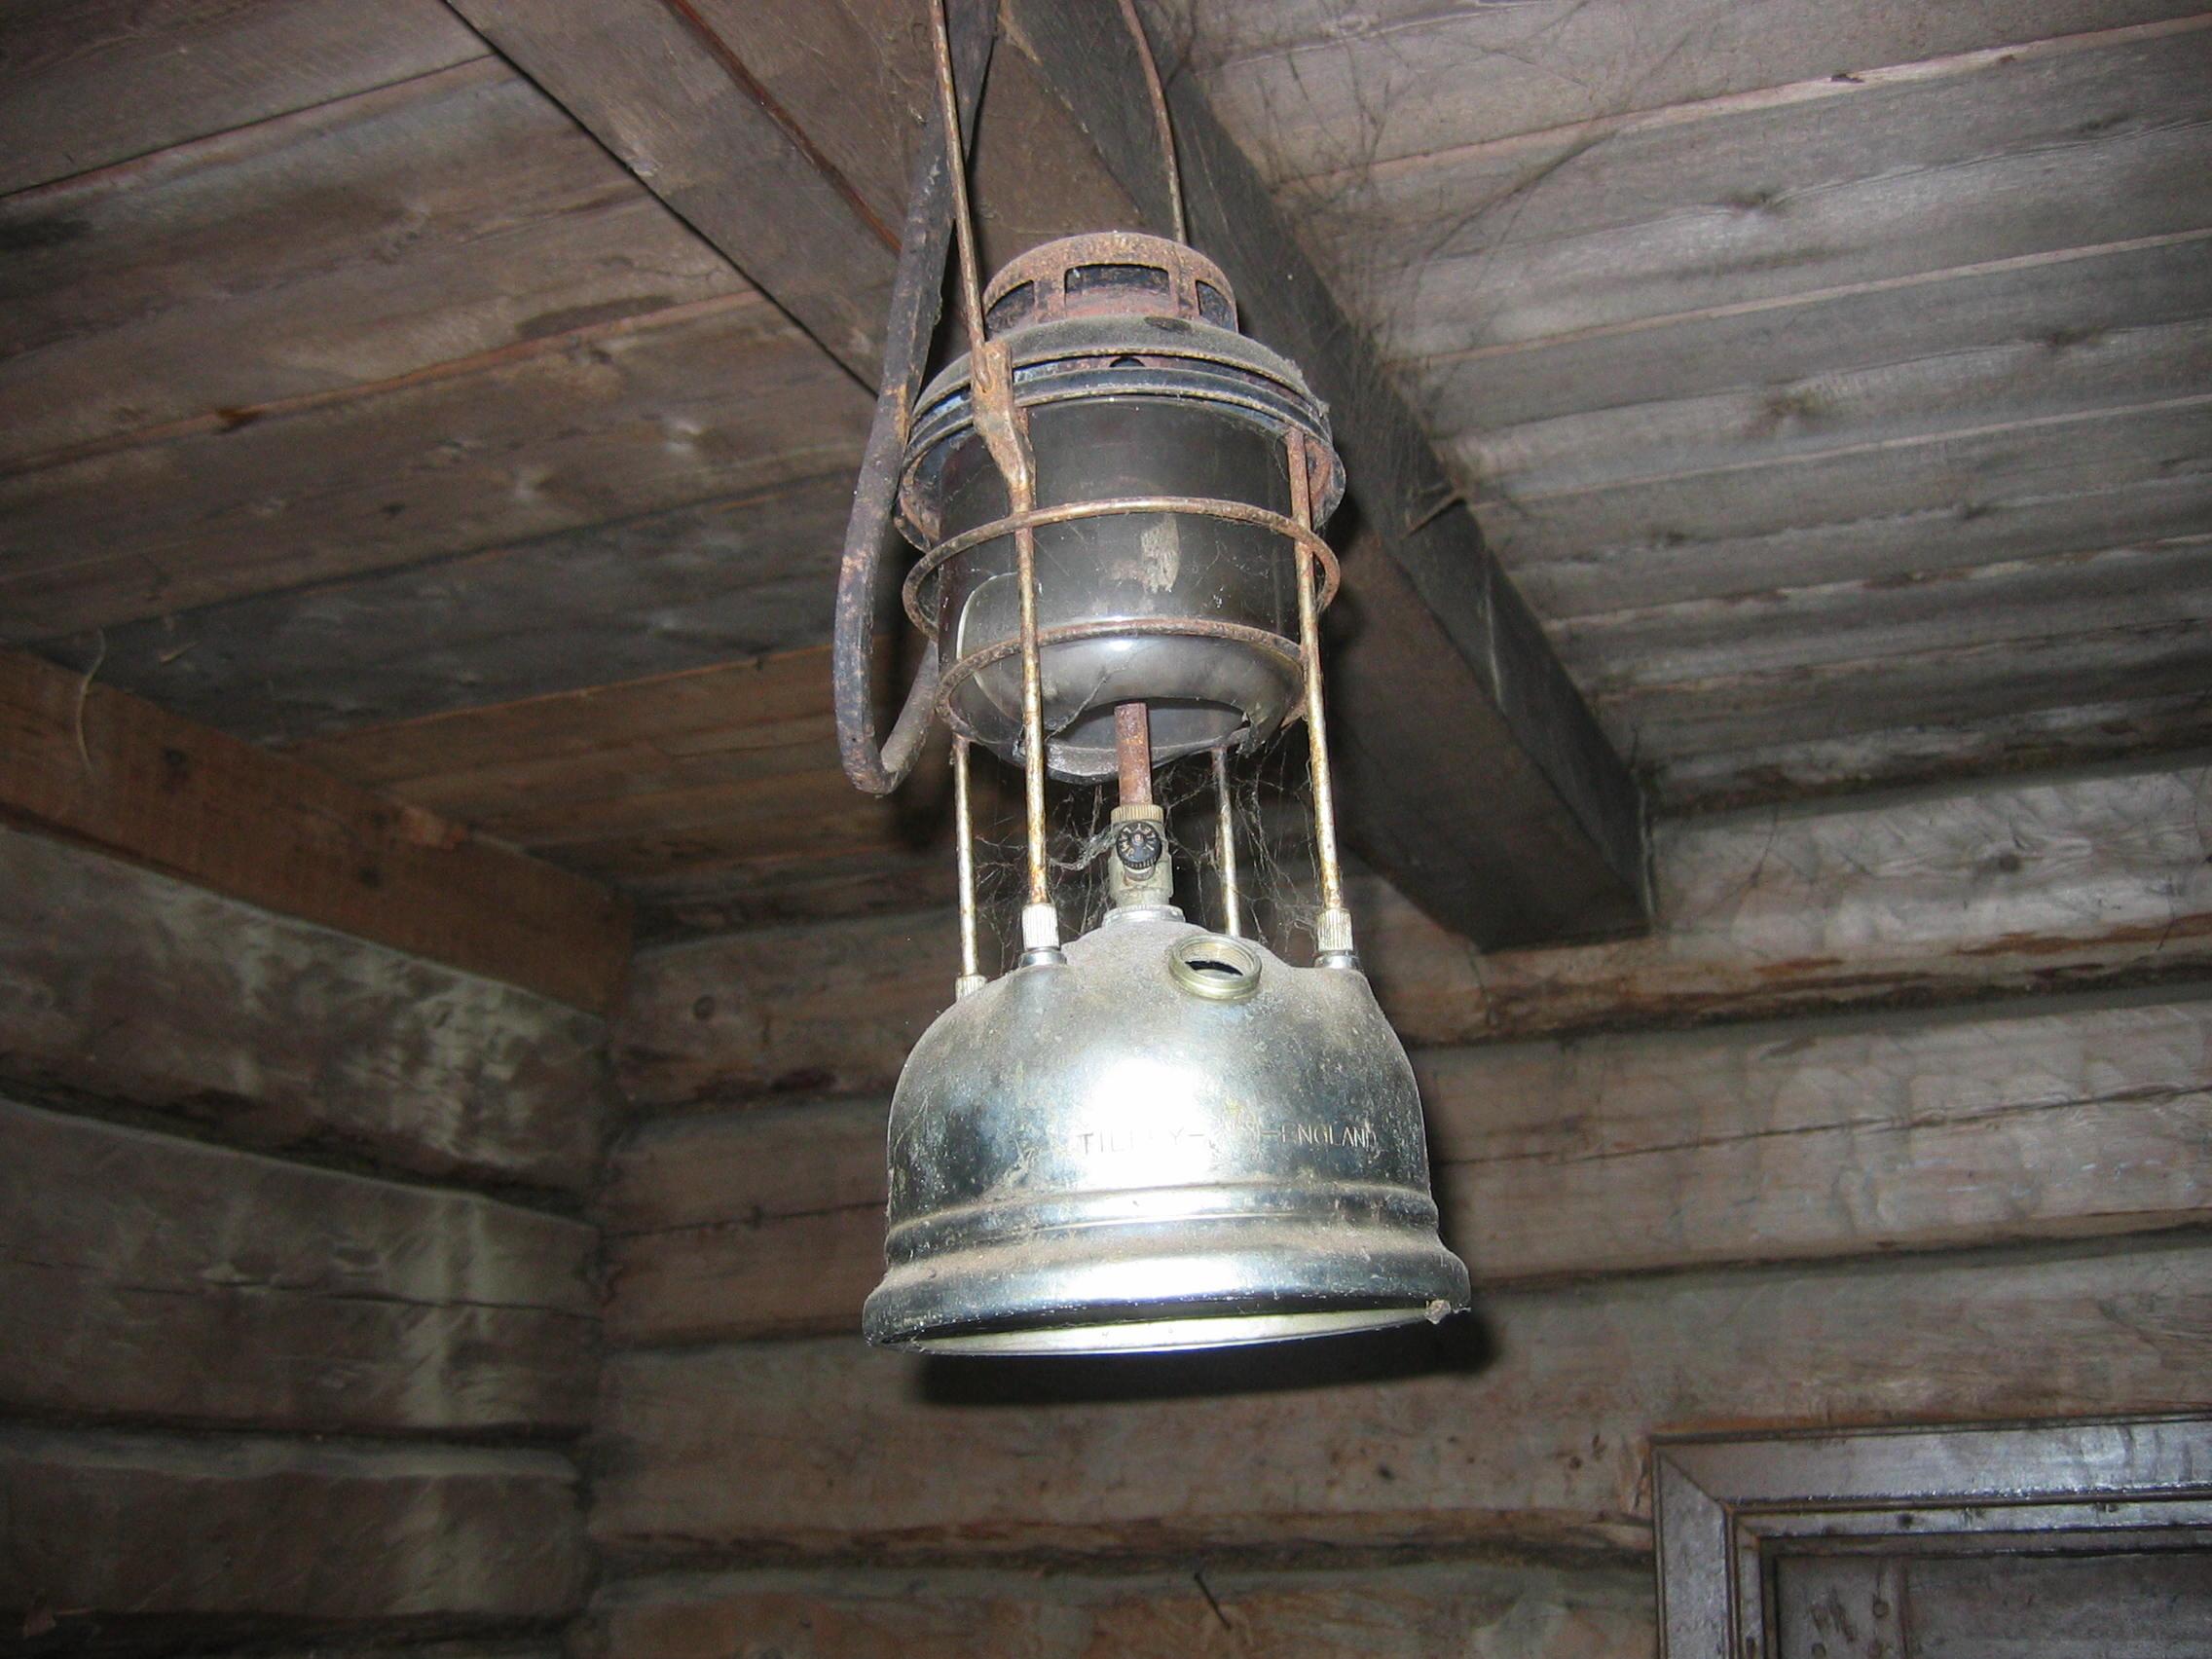 Tilley_lamp.JPG